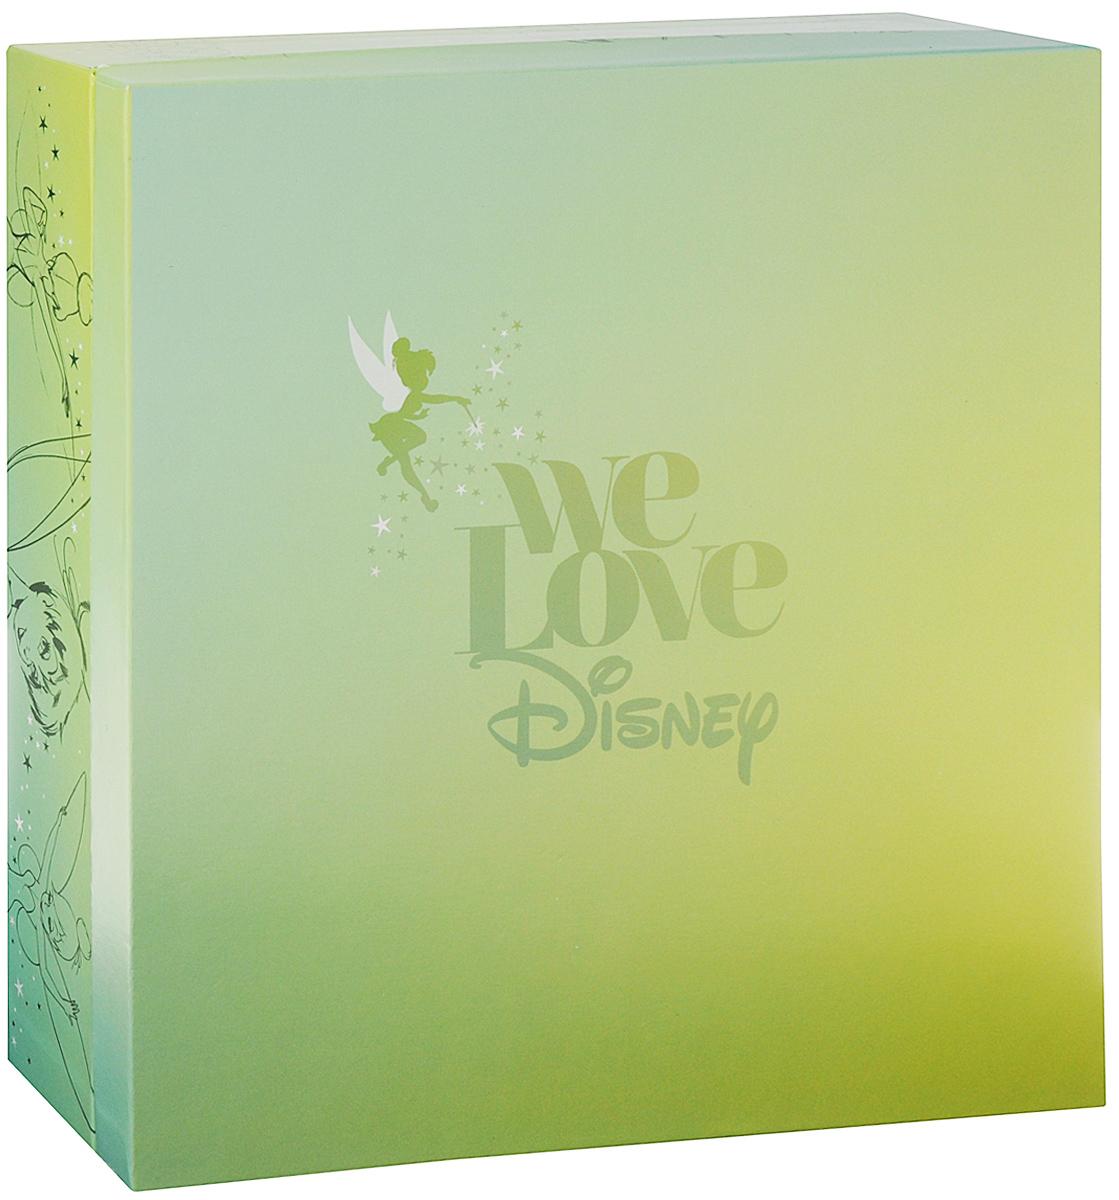 We Love Disney. Limited Edition (2 CD + DVD + 4 LP)